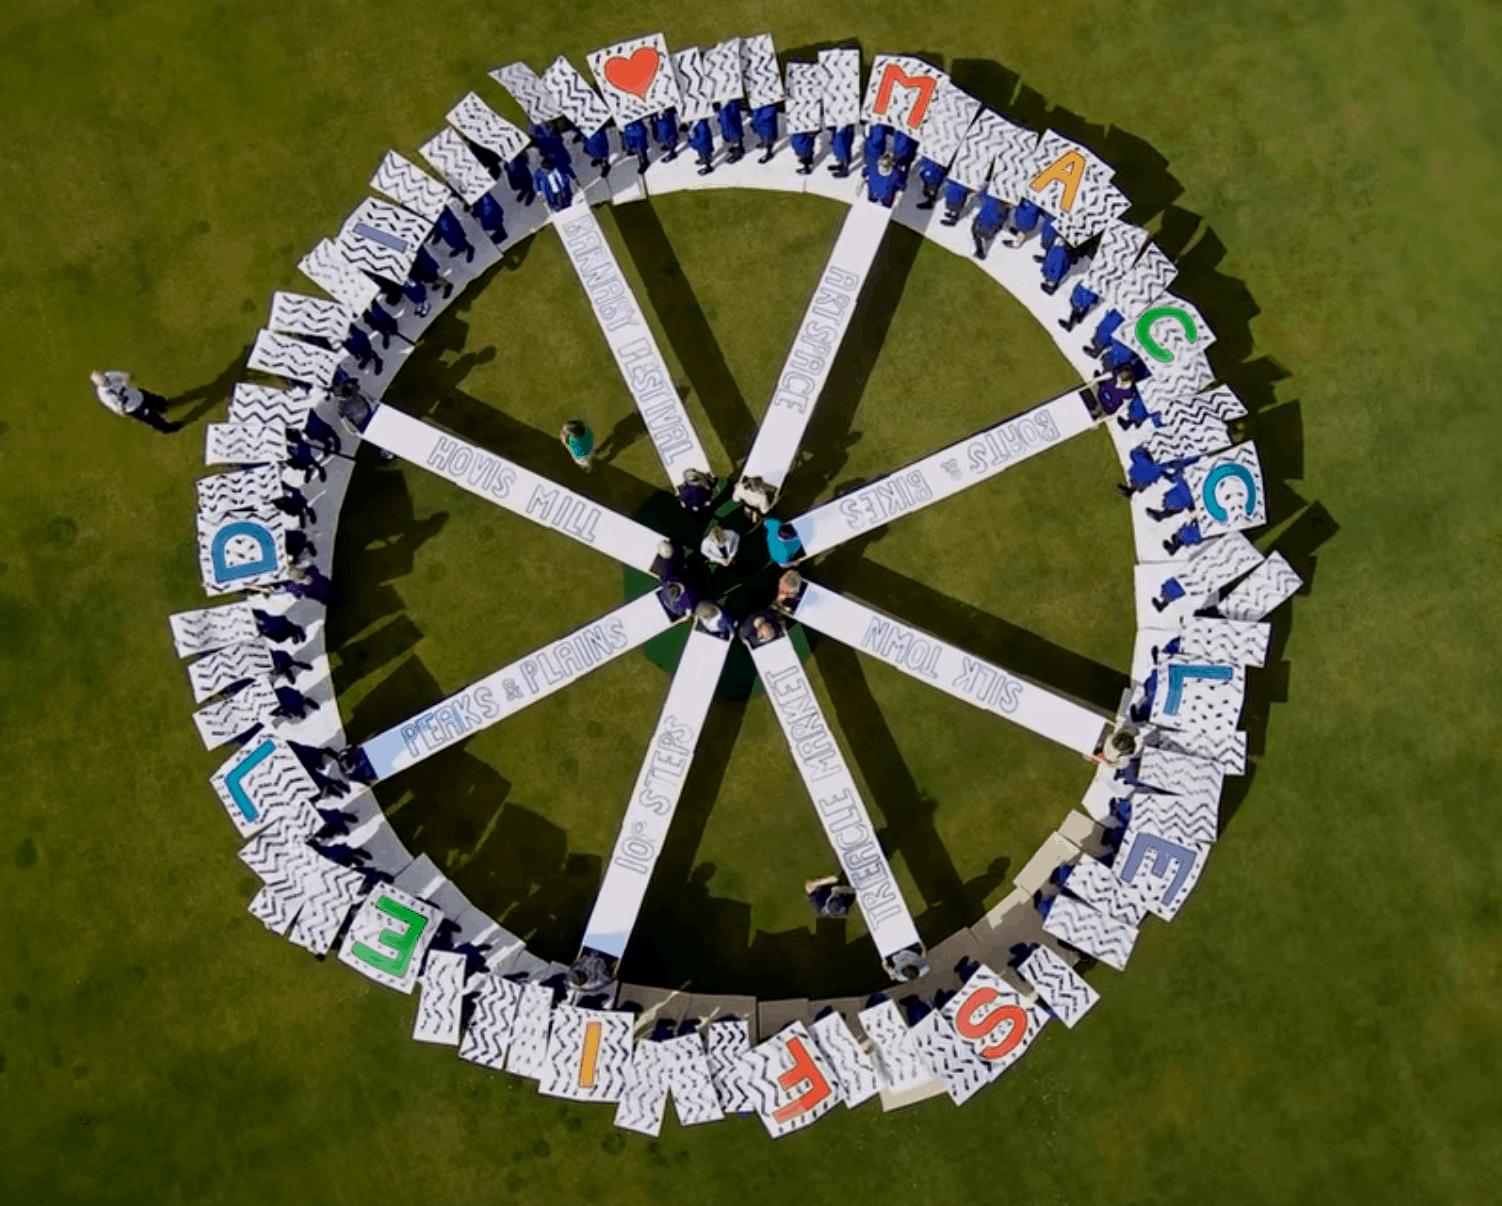 Aerial Artwork for Tour of Britain